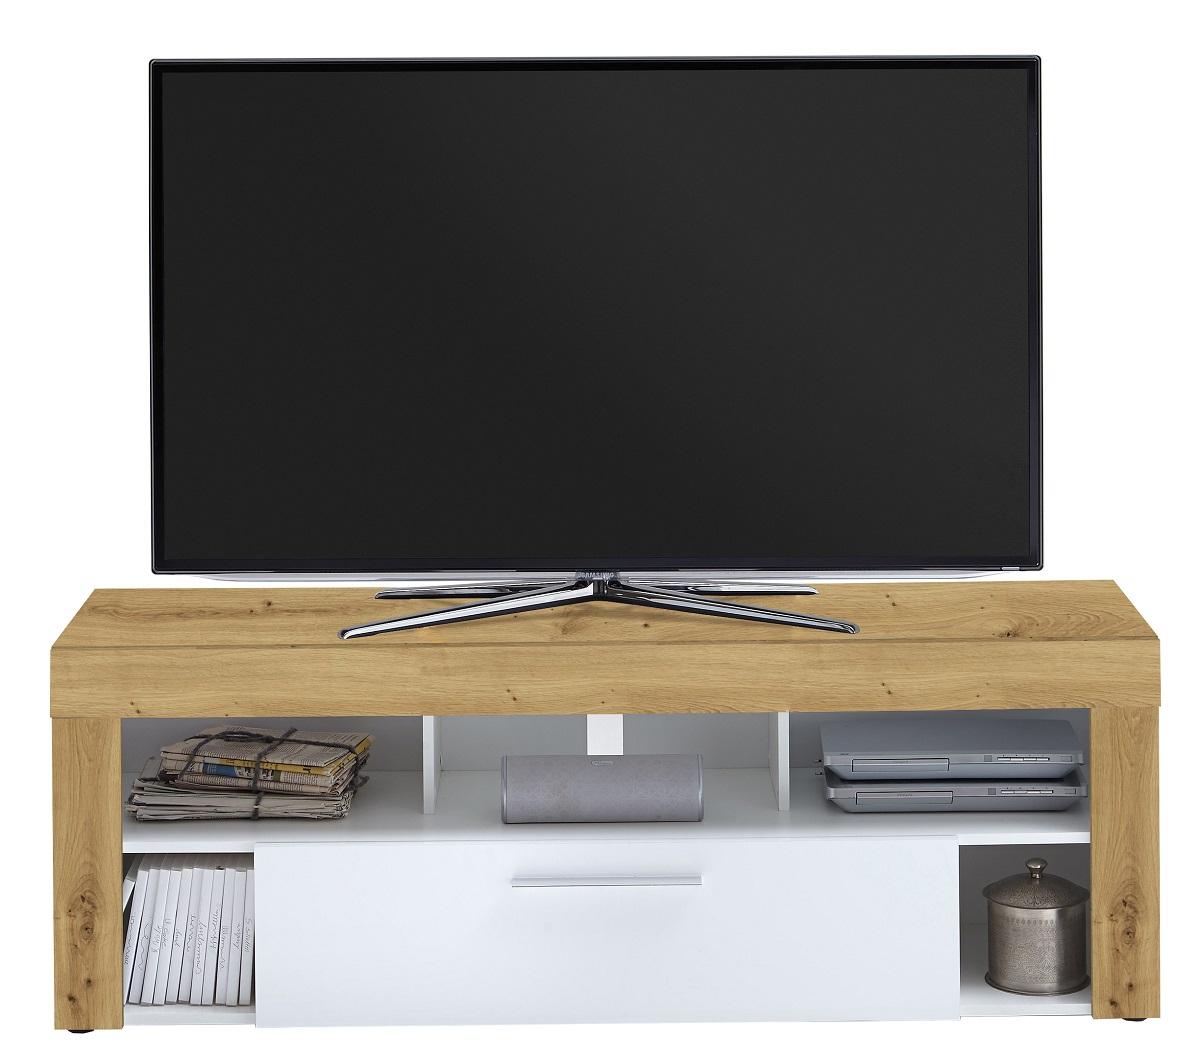 Tv-meubel Raymond 150 cm breed in artisan eiken met wit | FD Furniture